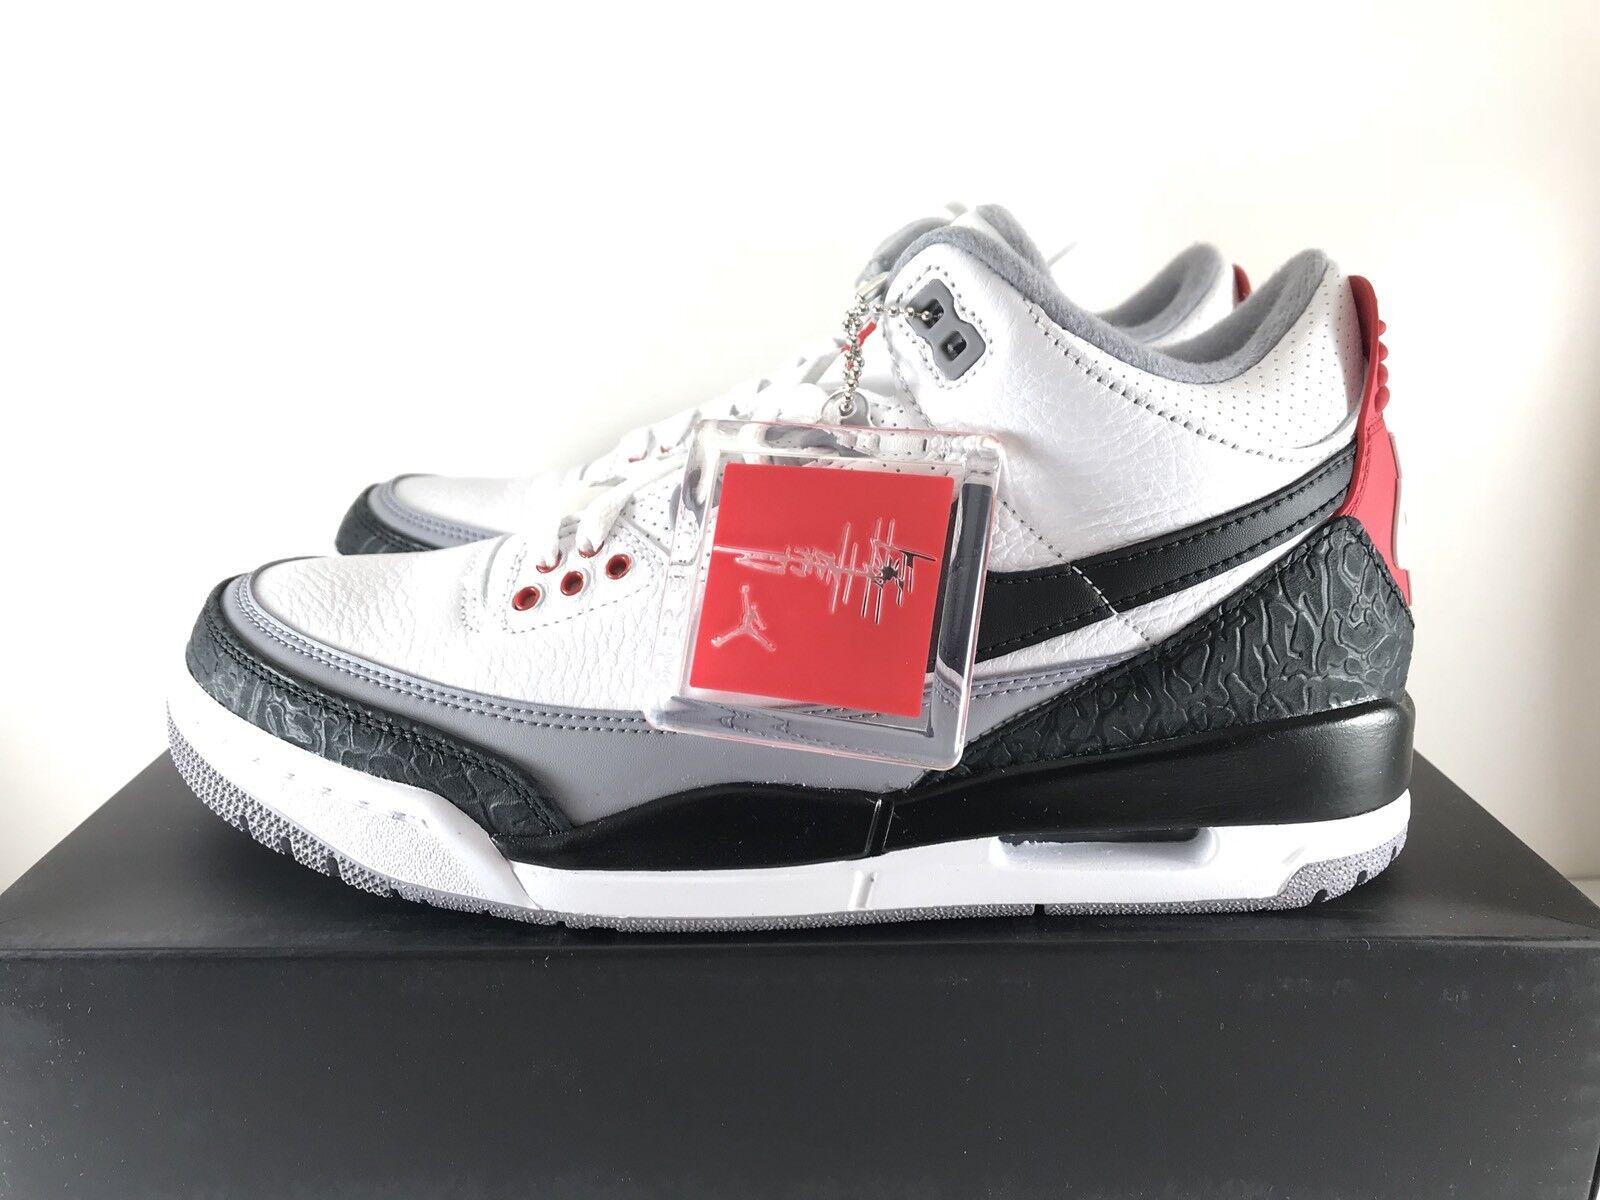 Nike air jordan retrò 3 nrg - hatfield cemento og aq3835-160 Uomo numero 9